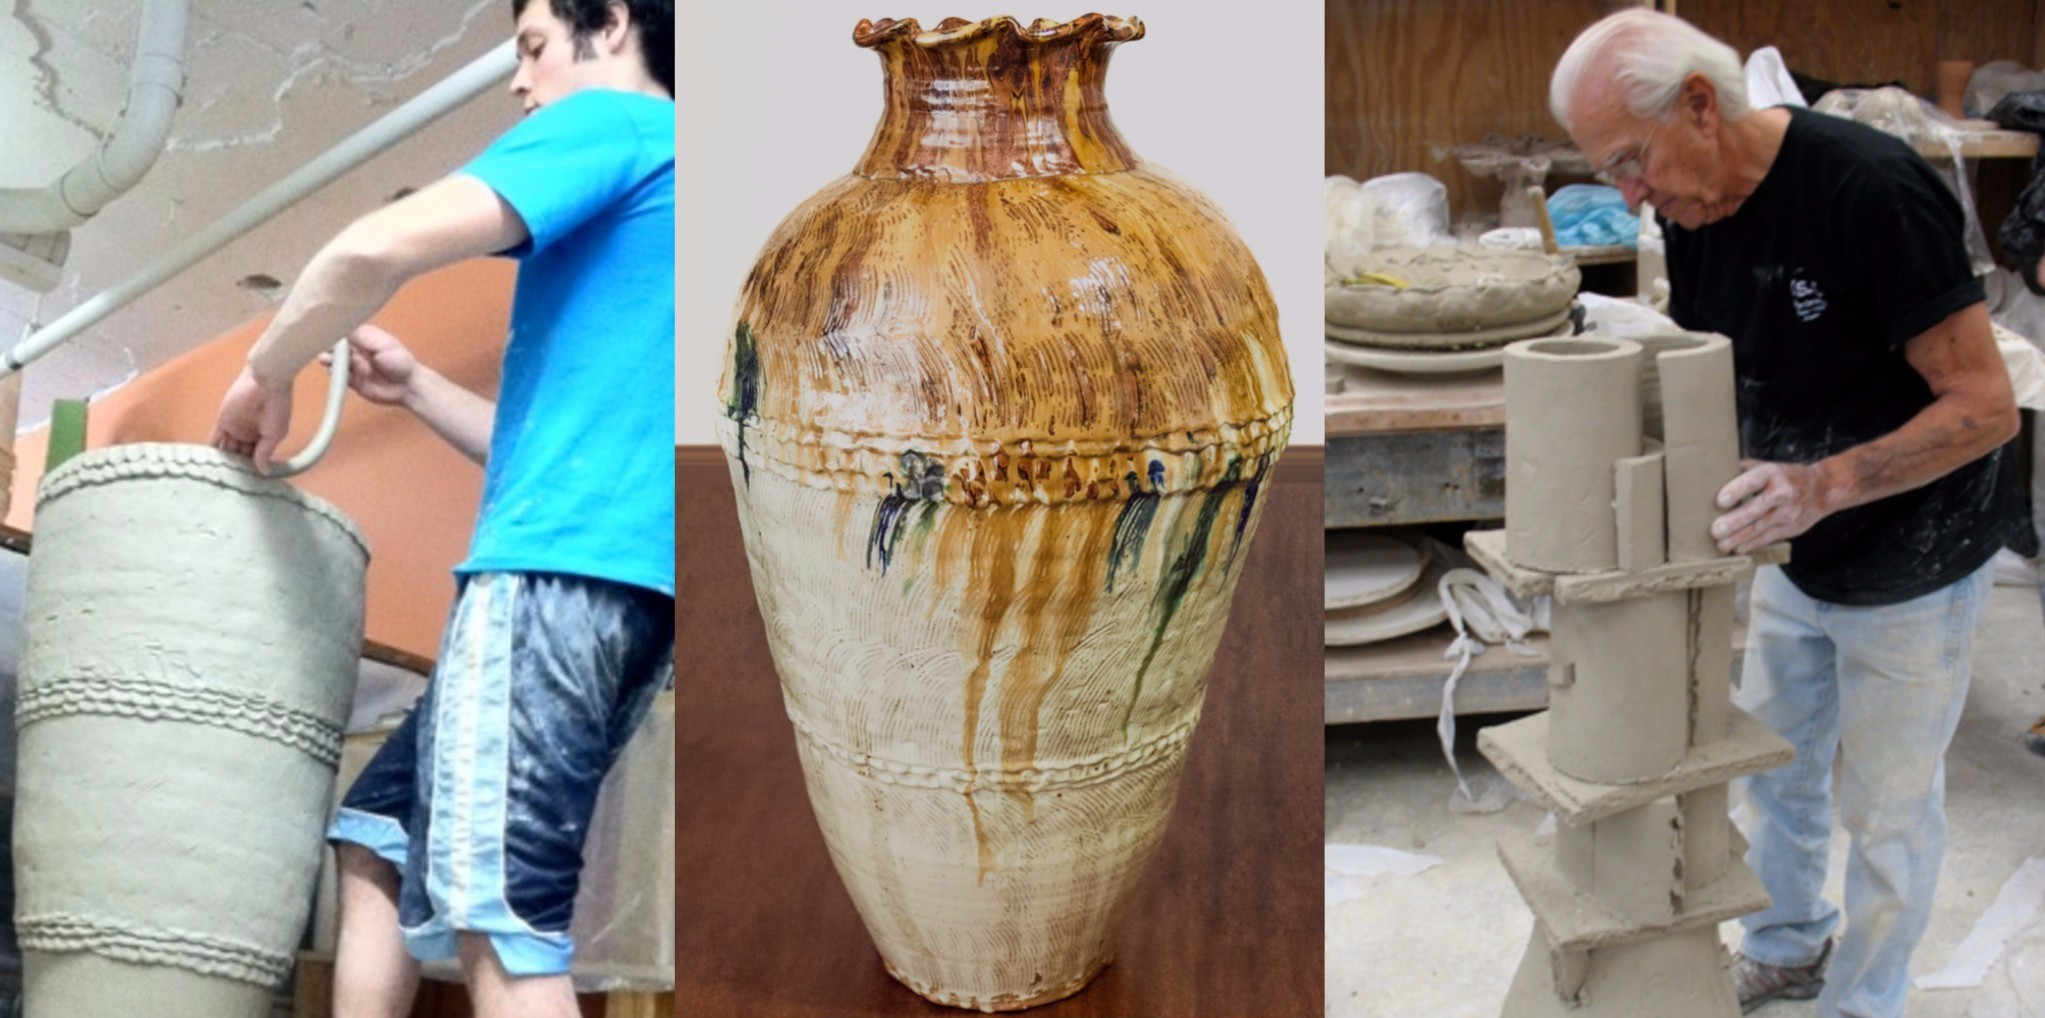 cherrico-pottery-big-pots-coil-jars-don-reitz-workshop-edited-1-.jpg